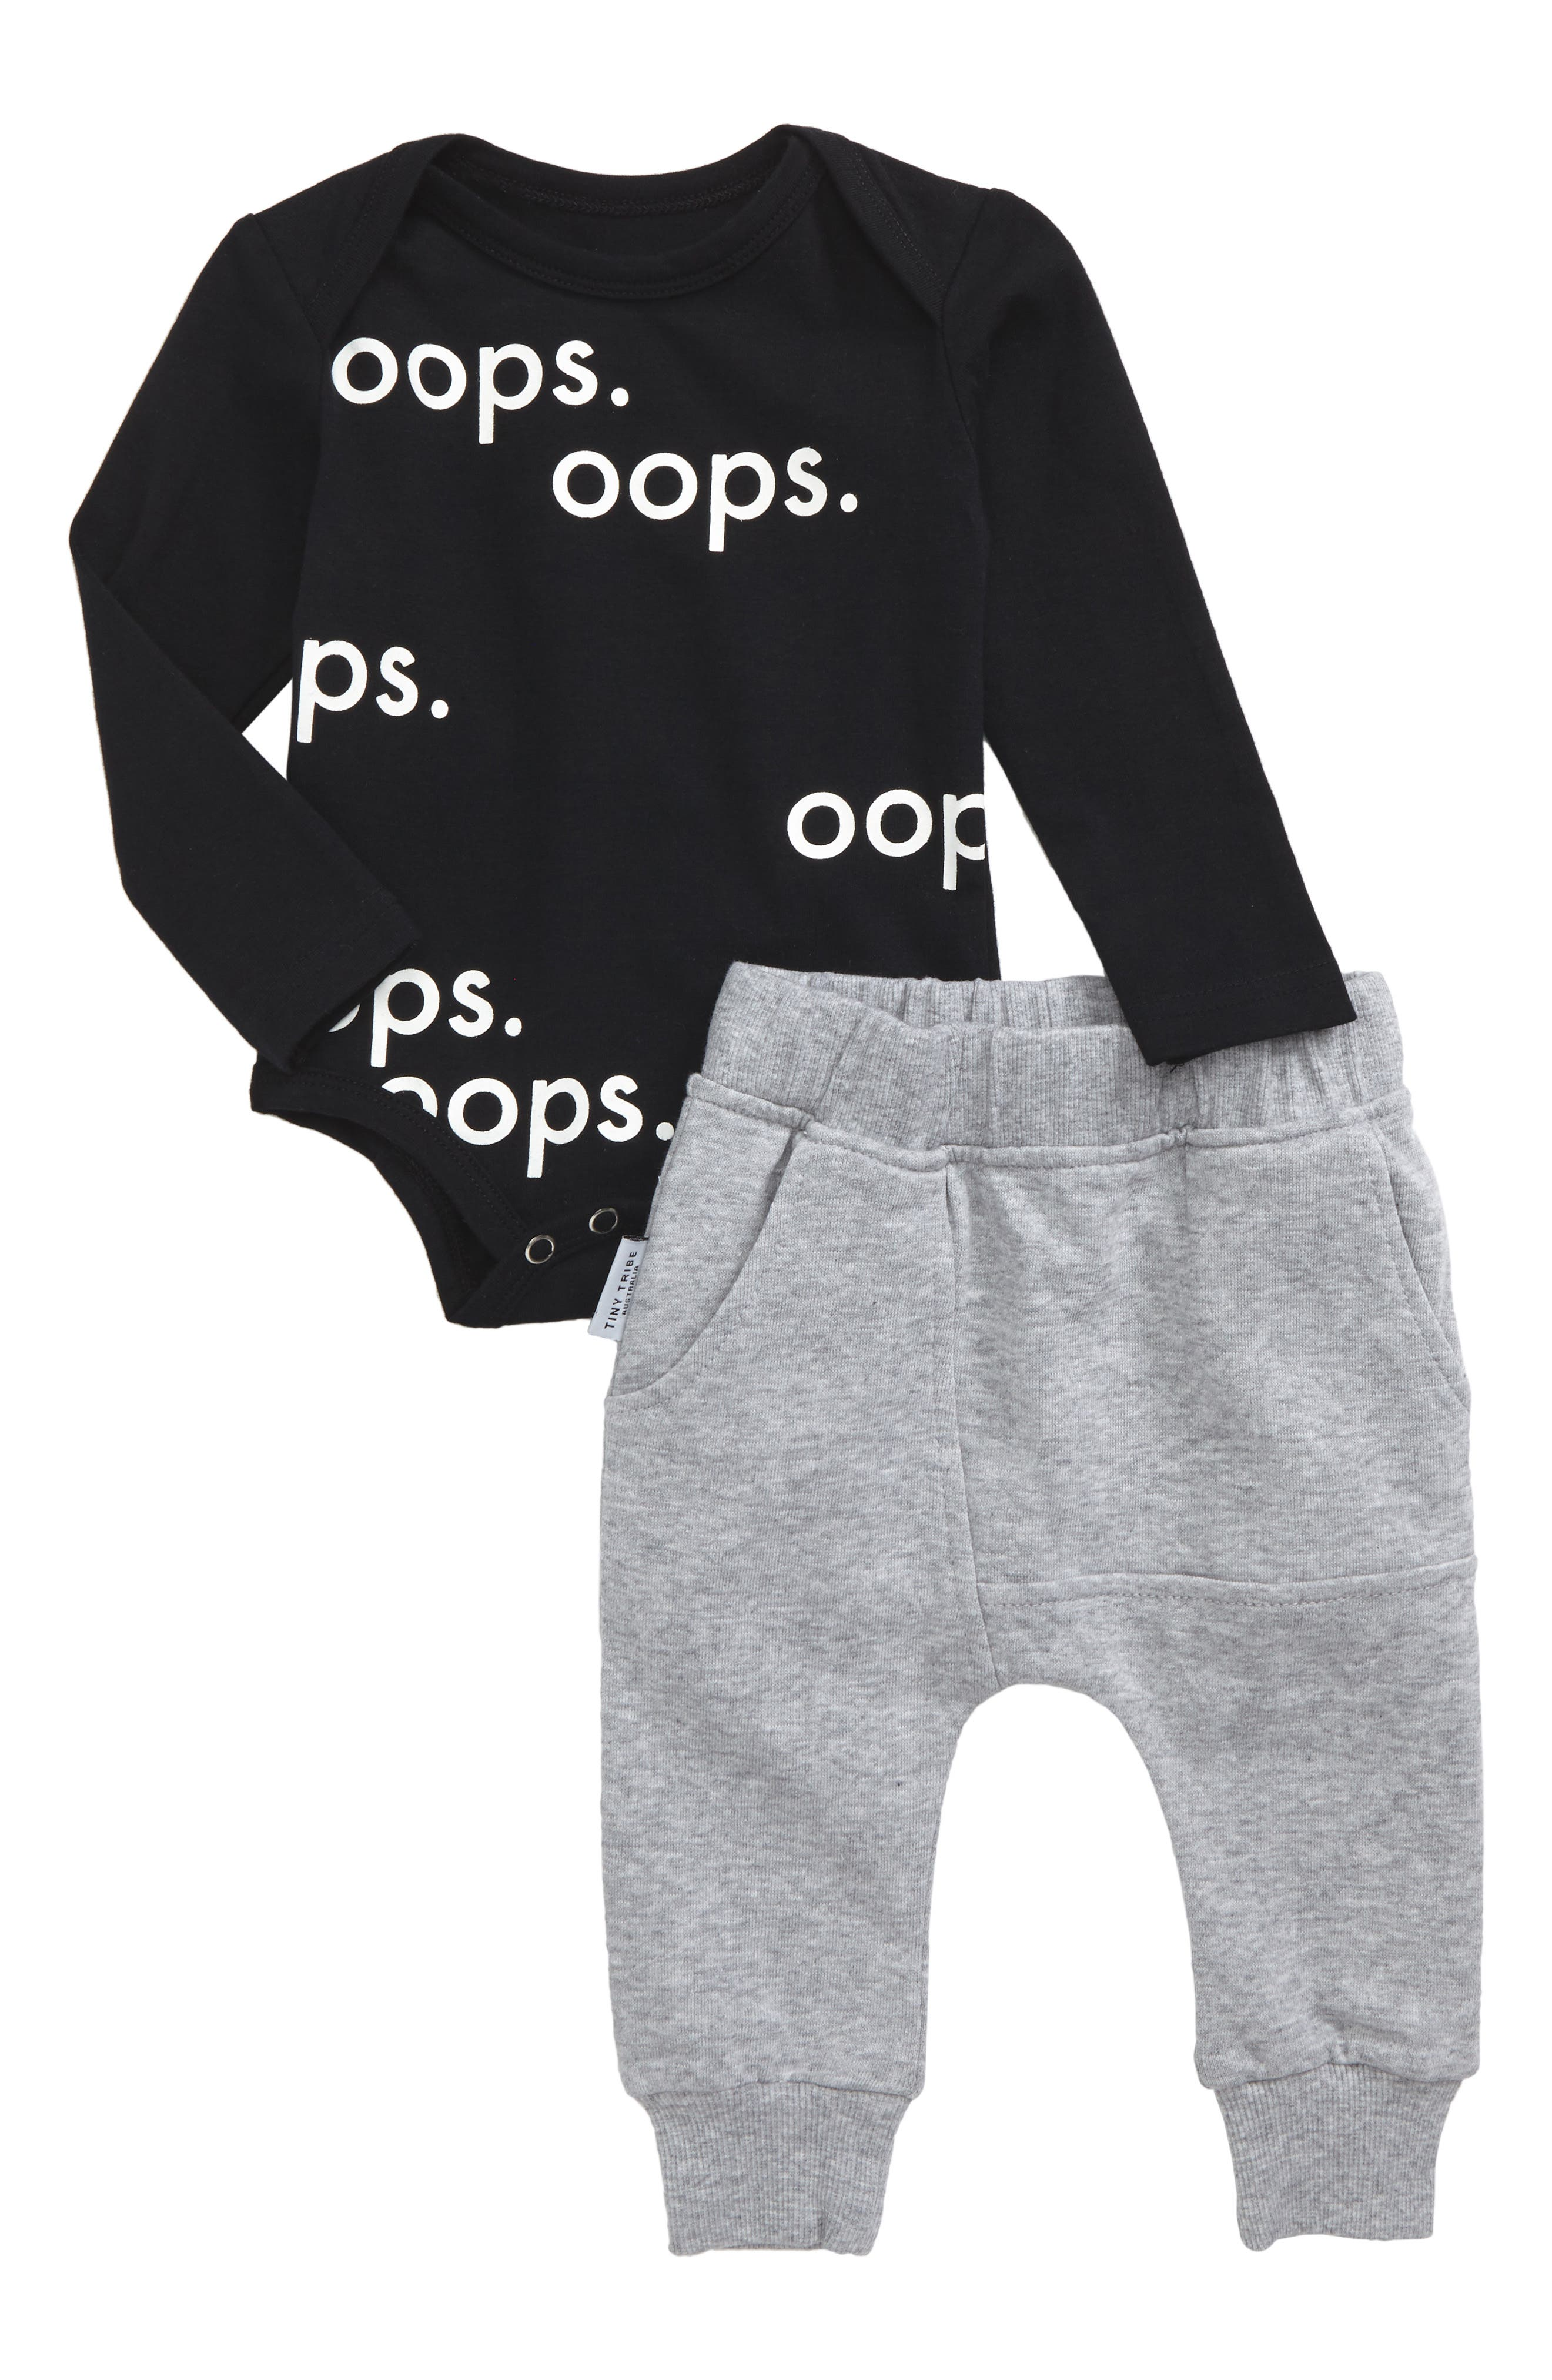 Tiny Tribe Oops Bodysuit & Sweatpants Set (Baby)